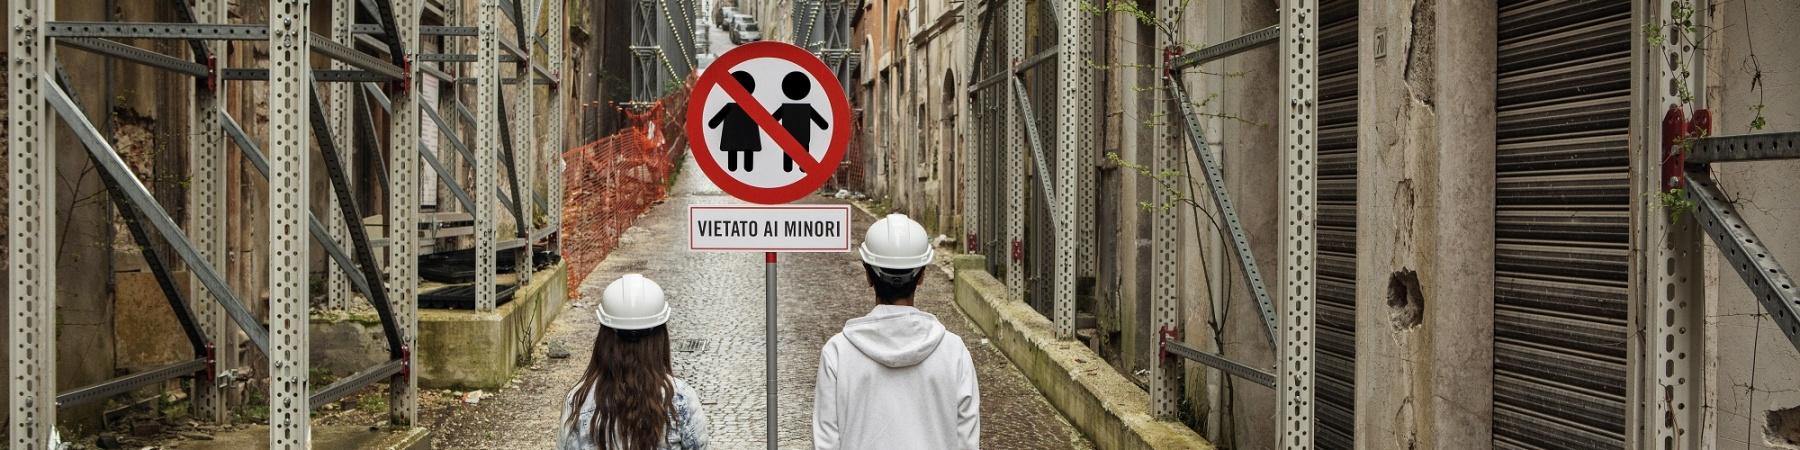 Italia vietata ai minori